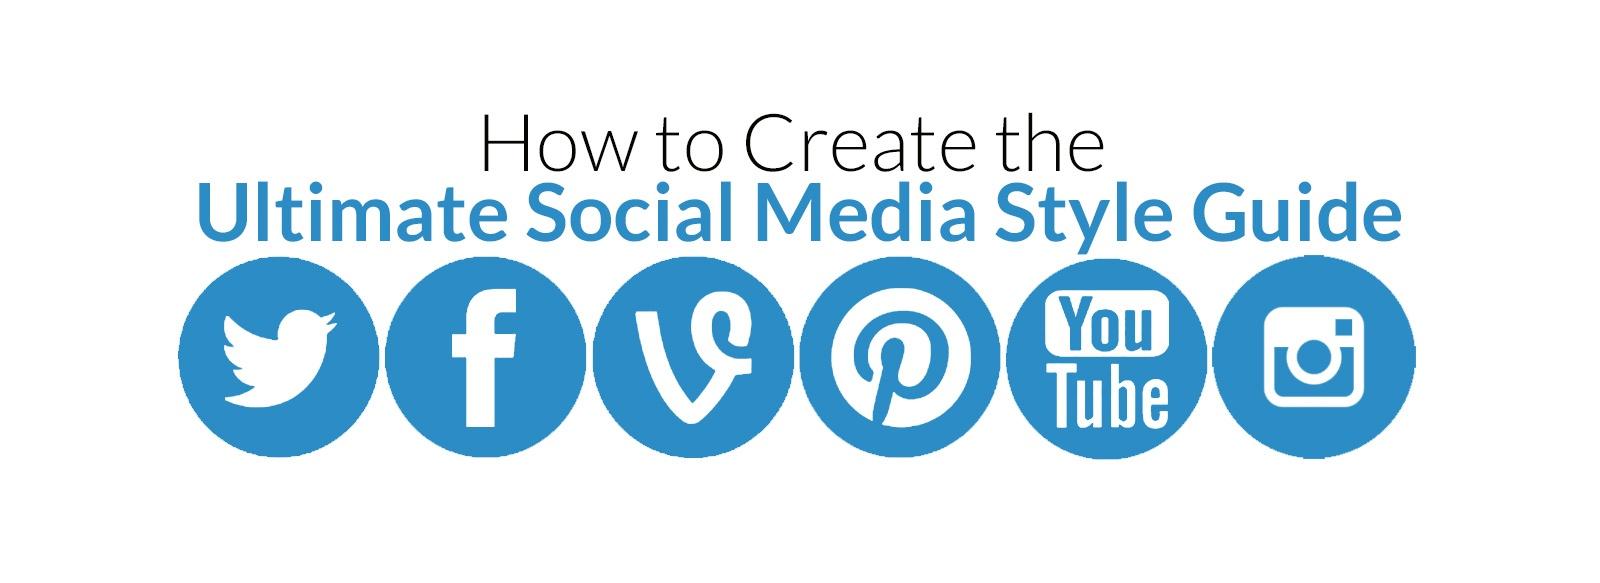 ultimate-social-guide-intext.jpg